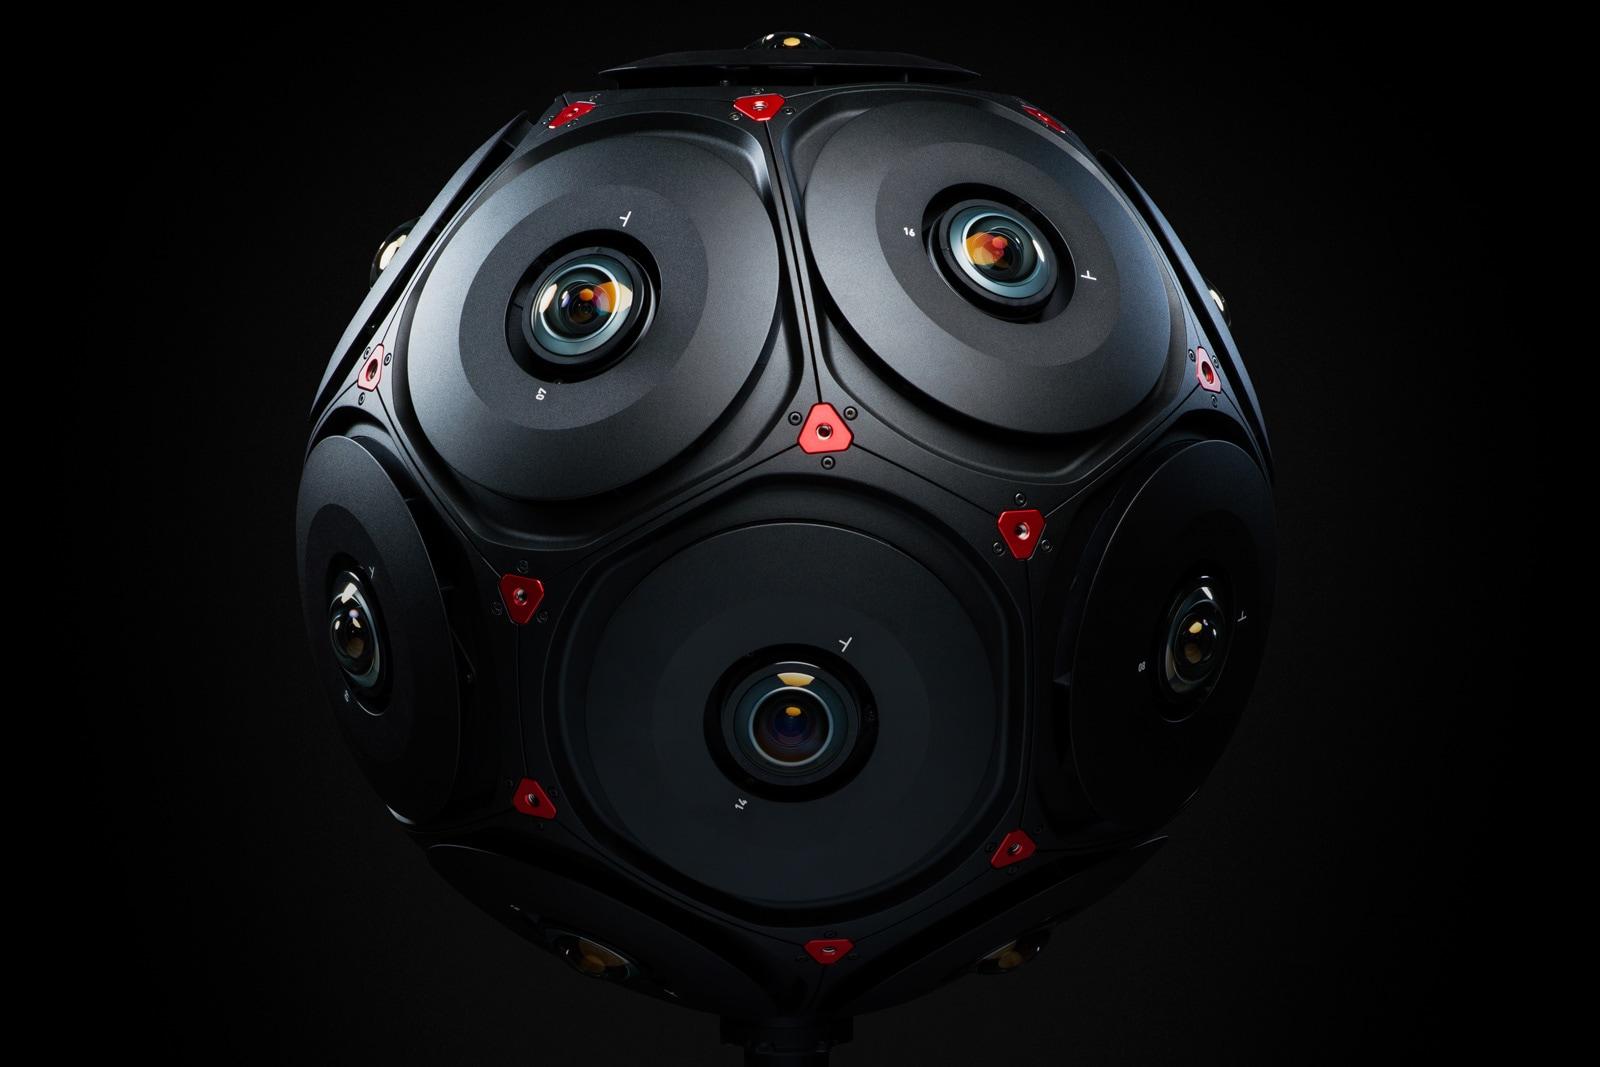 dims?quality=100&image uri=https%3A%2F%2Fs.aolcdn.com%2Fhss%2Fstorage%2Fmidas%2F45ccbc8e95e6da69f54f2799f96823d7%2F206694084%2Fred manifold - 360º Cameras (The Best & Worst)